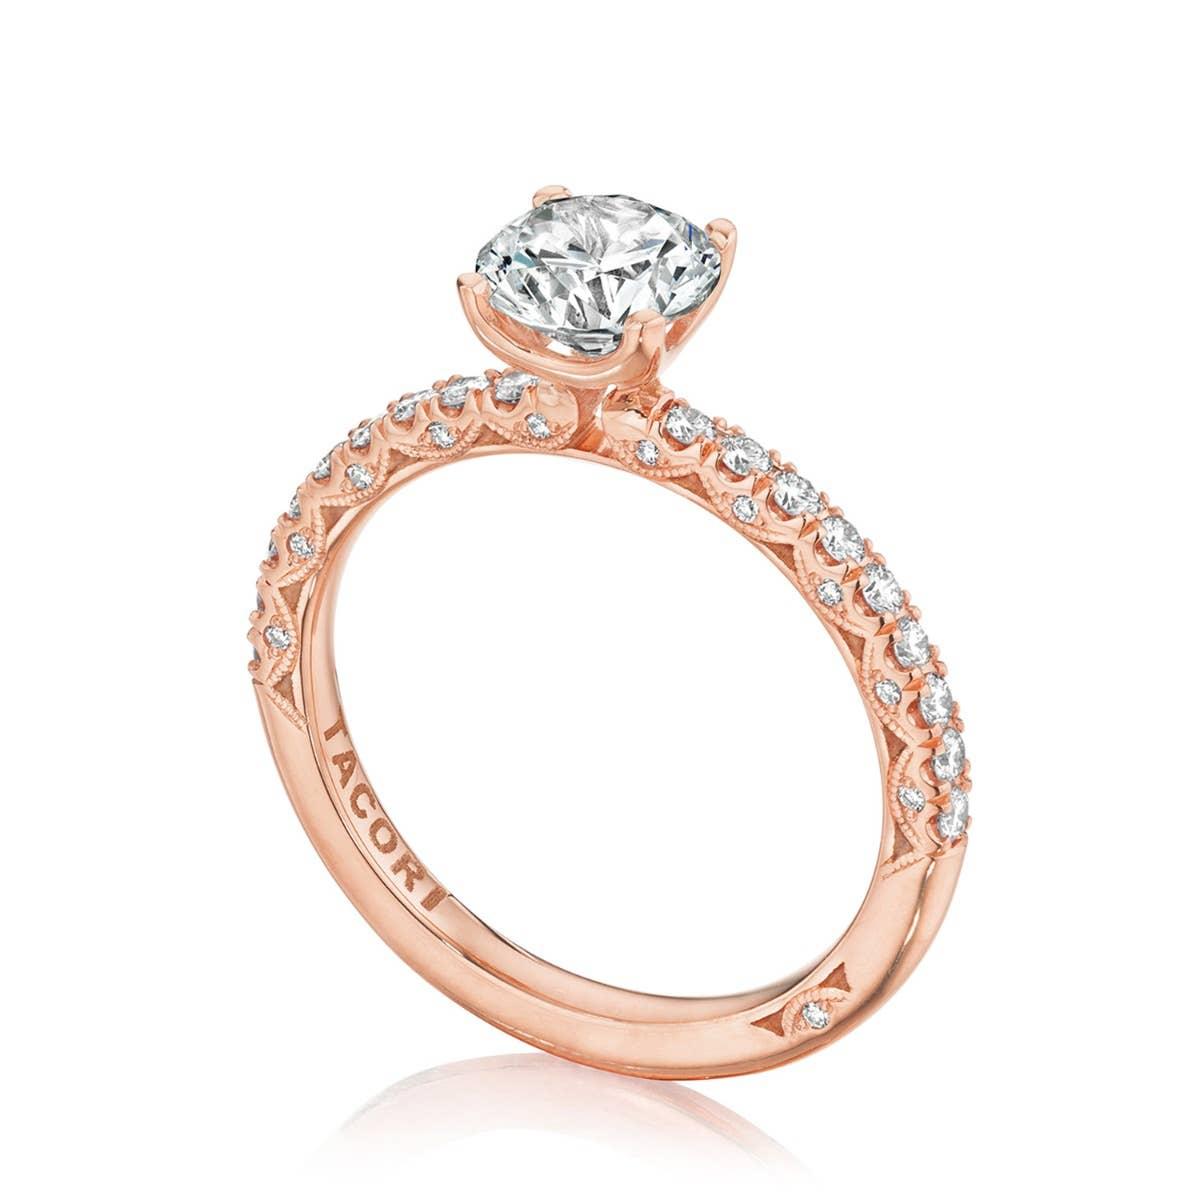 Round engagement ring from Tacori